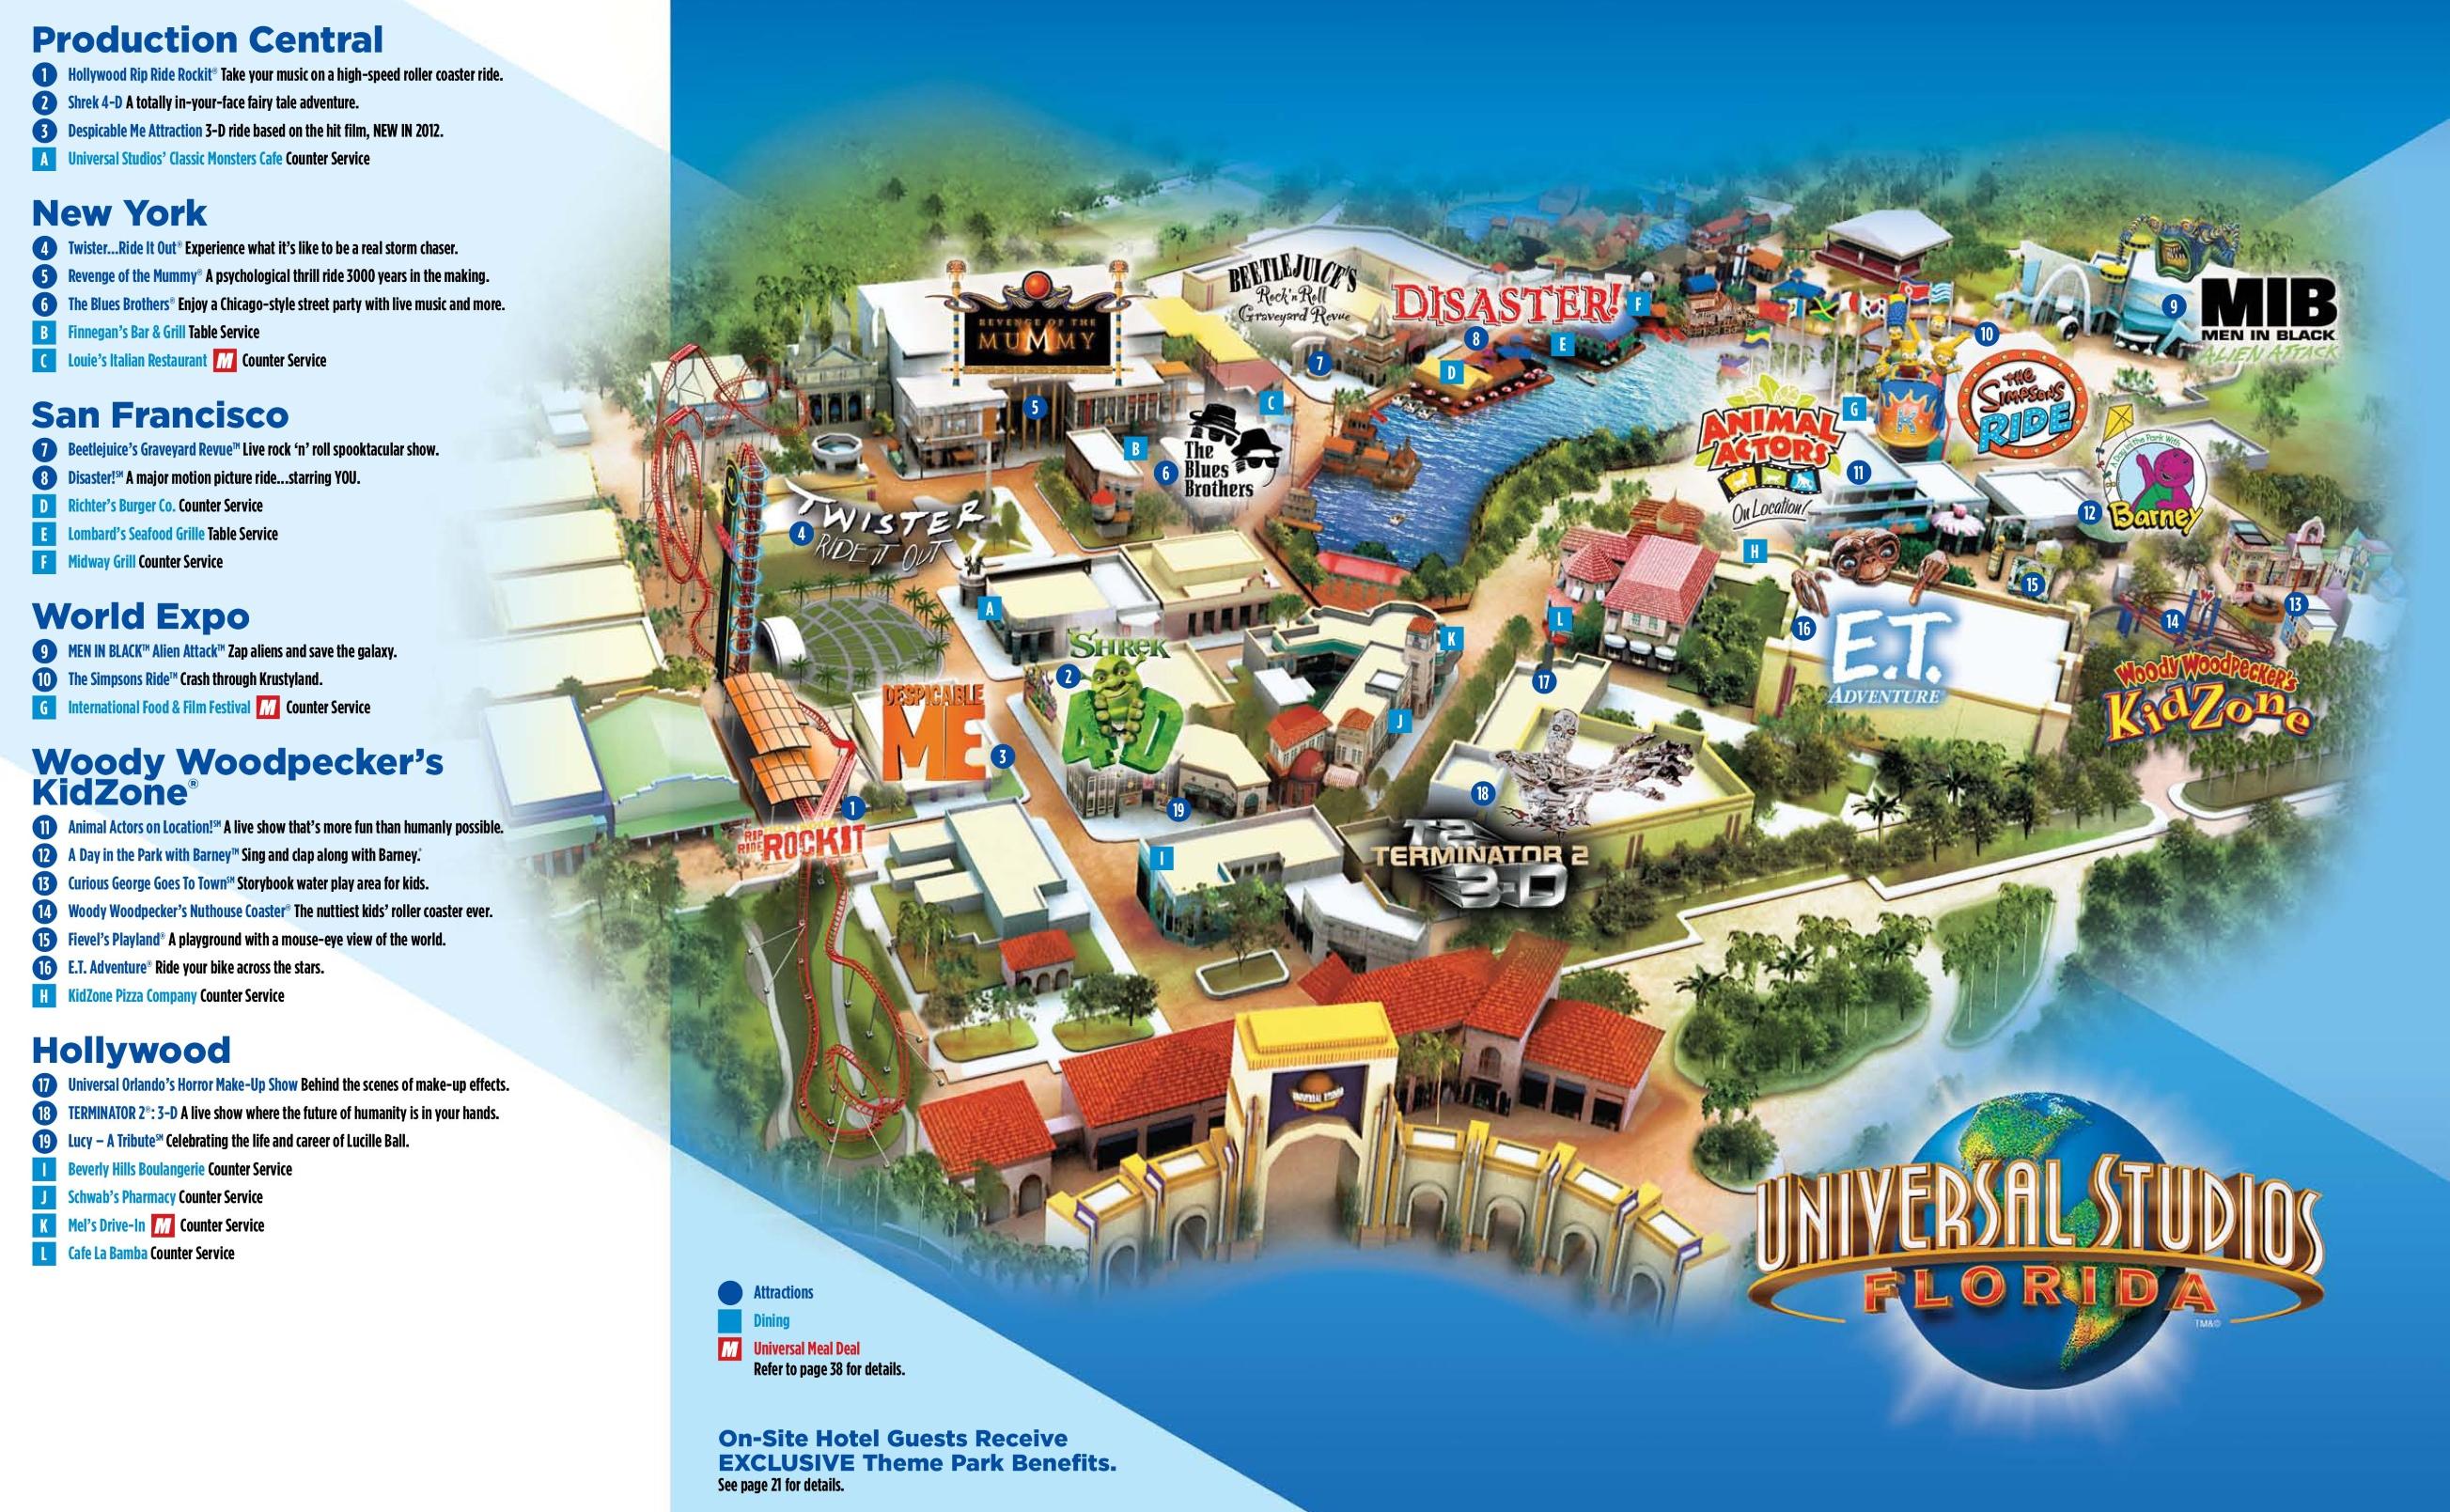 Orlando Universal Studios Florida Map Map Hd Universal Studios Map - Universal Studios Florida Map 2018